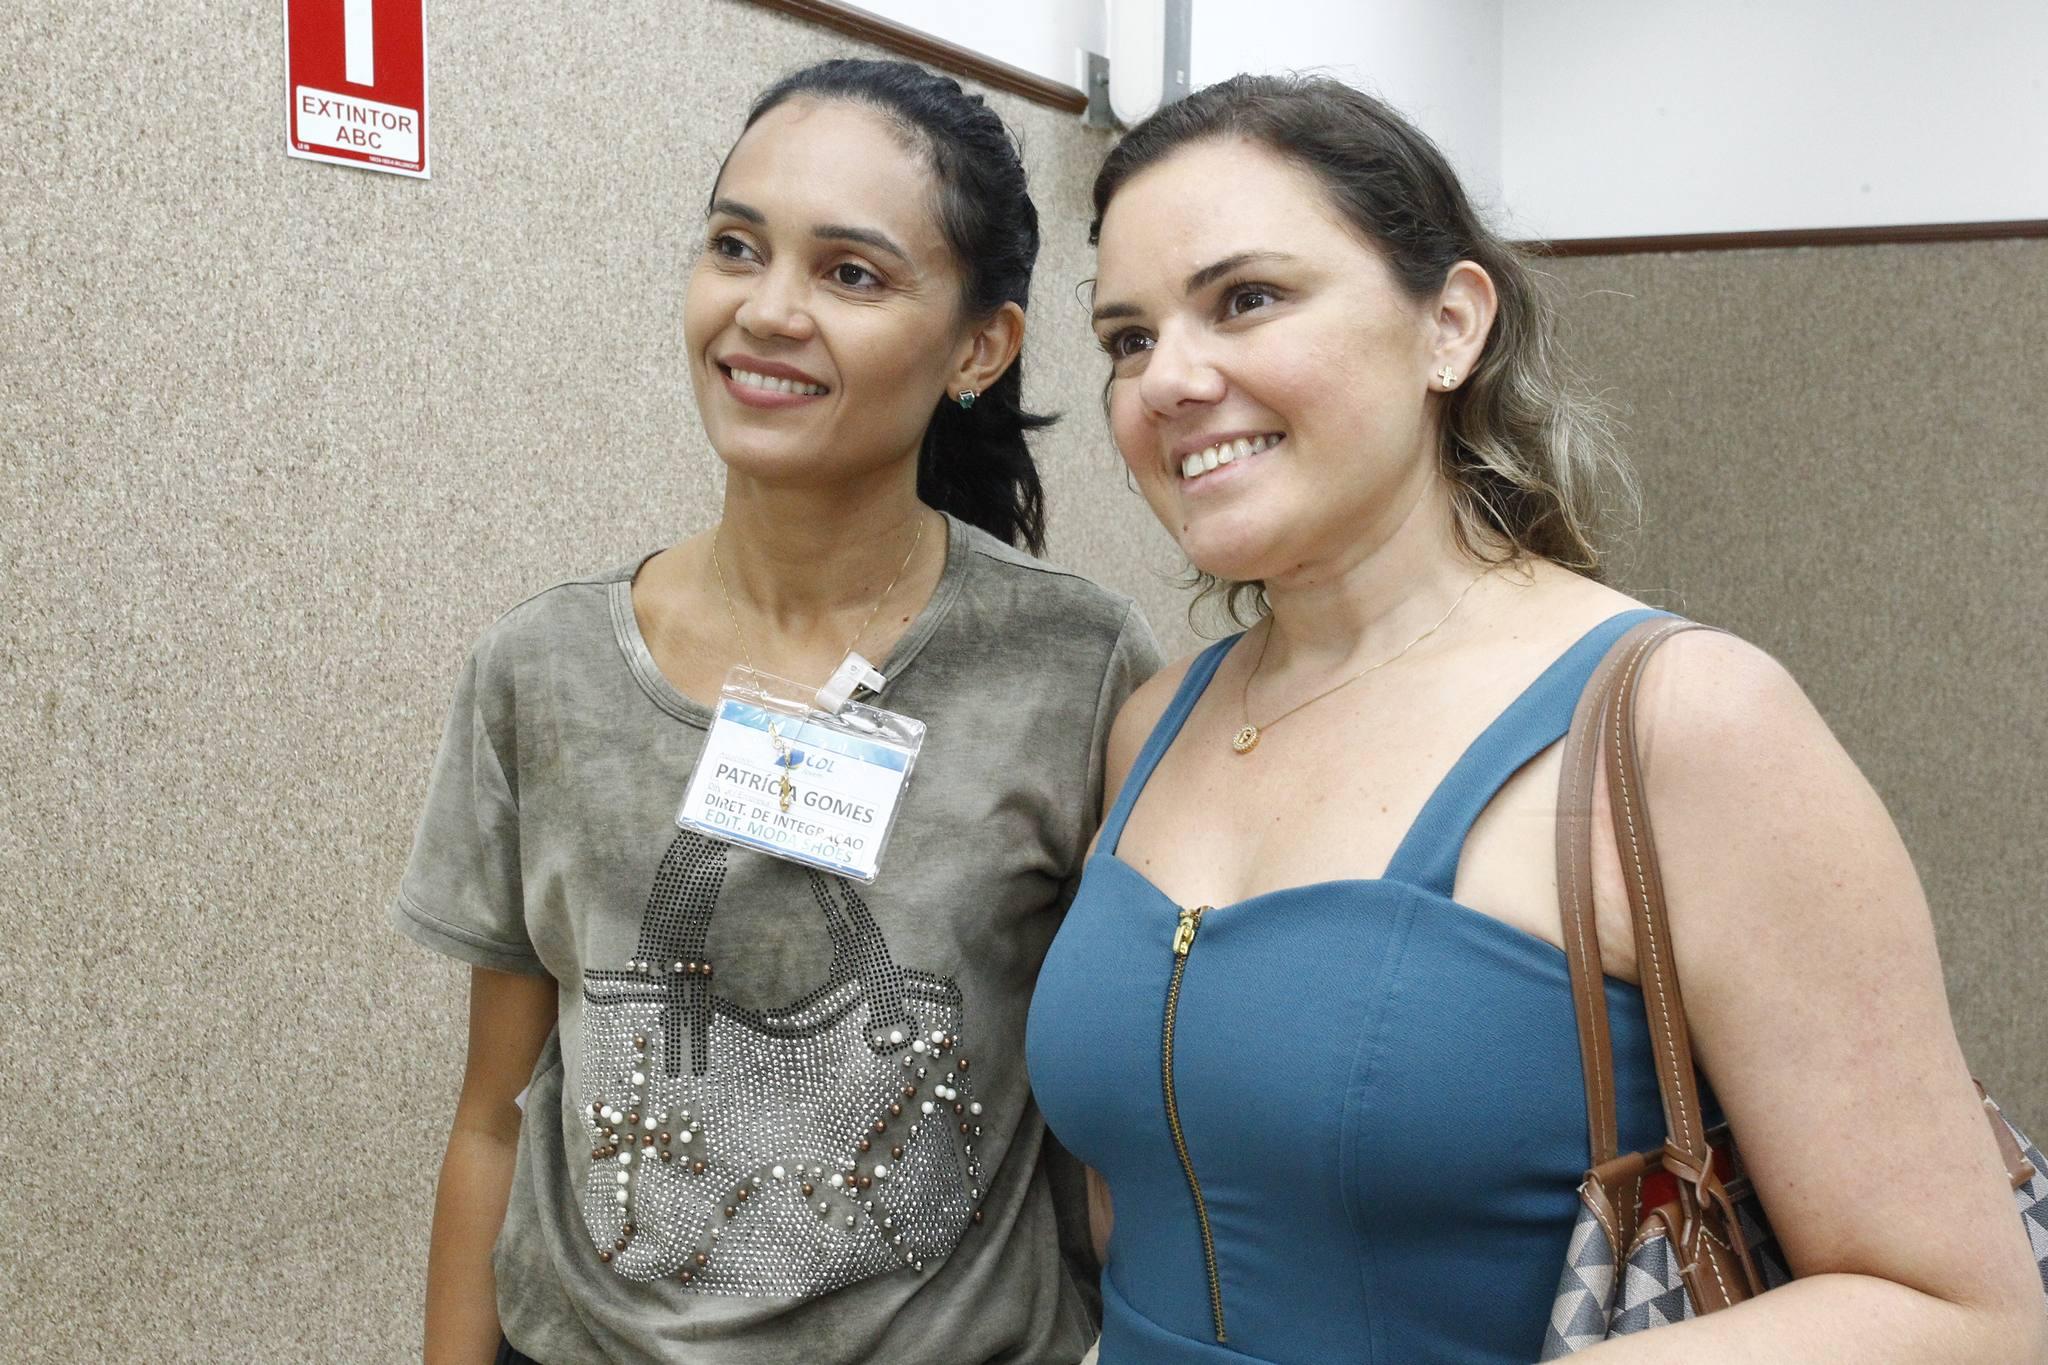 Patricia Gomes E Flimeria Ferreira